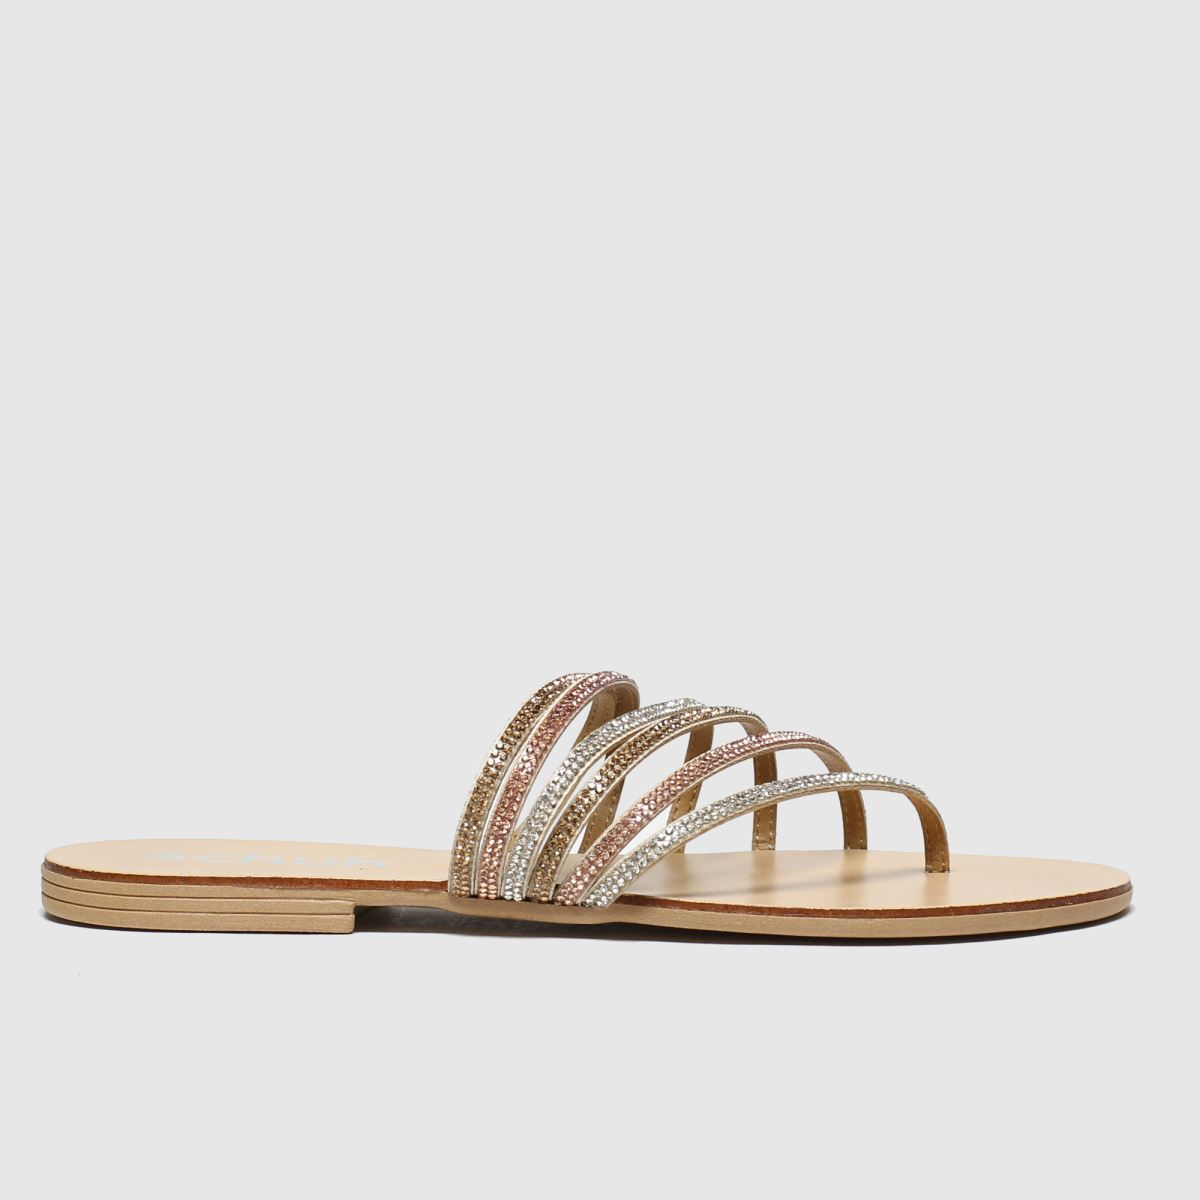 schuh Schuh Multi Bahrain Sandals